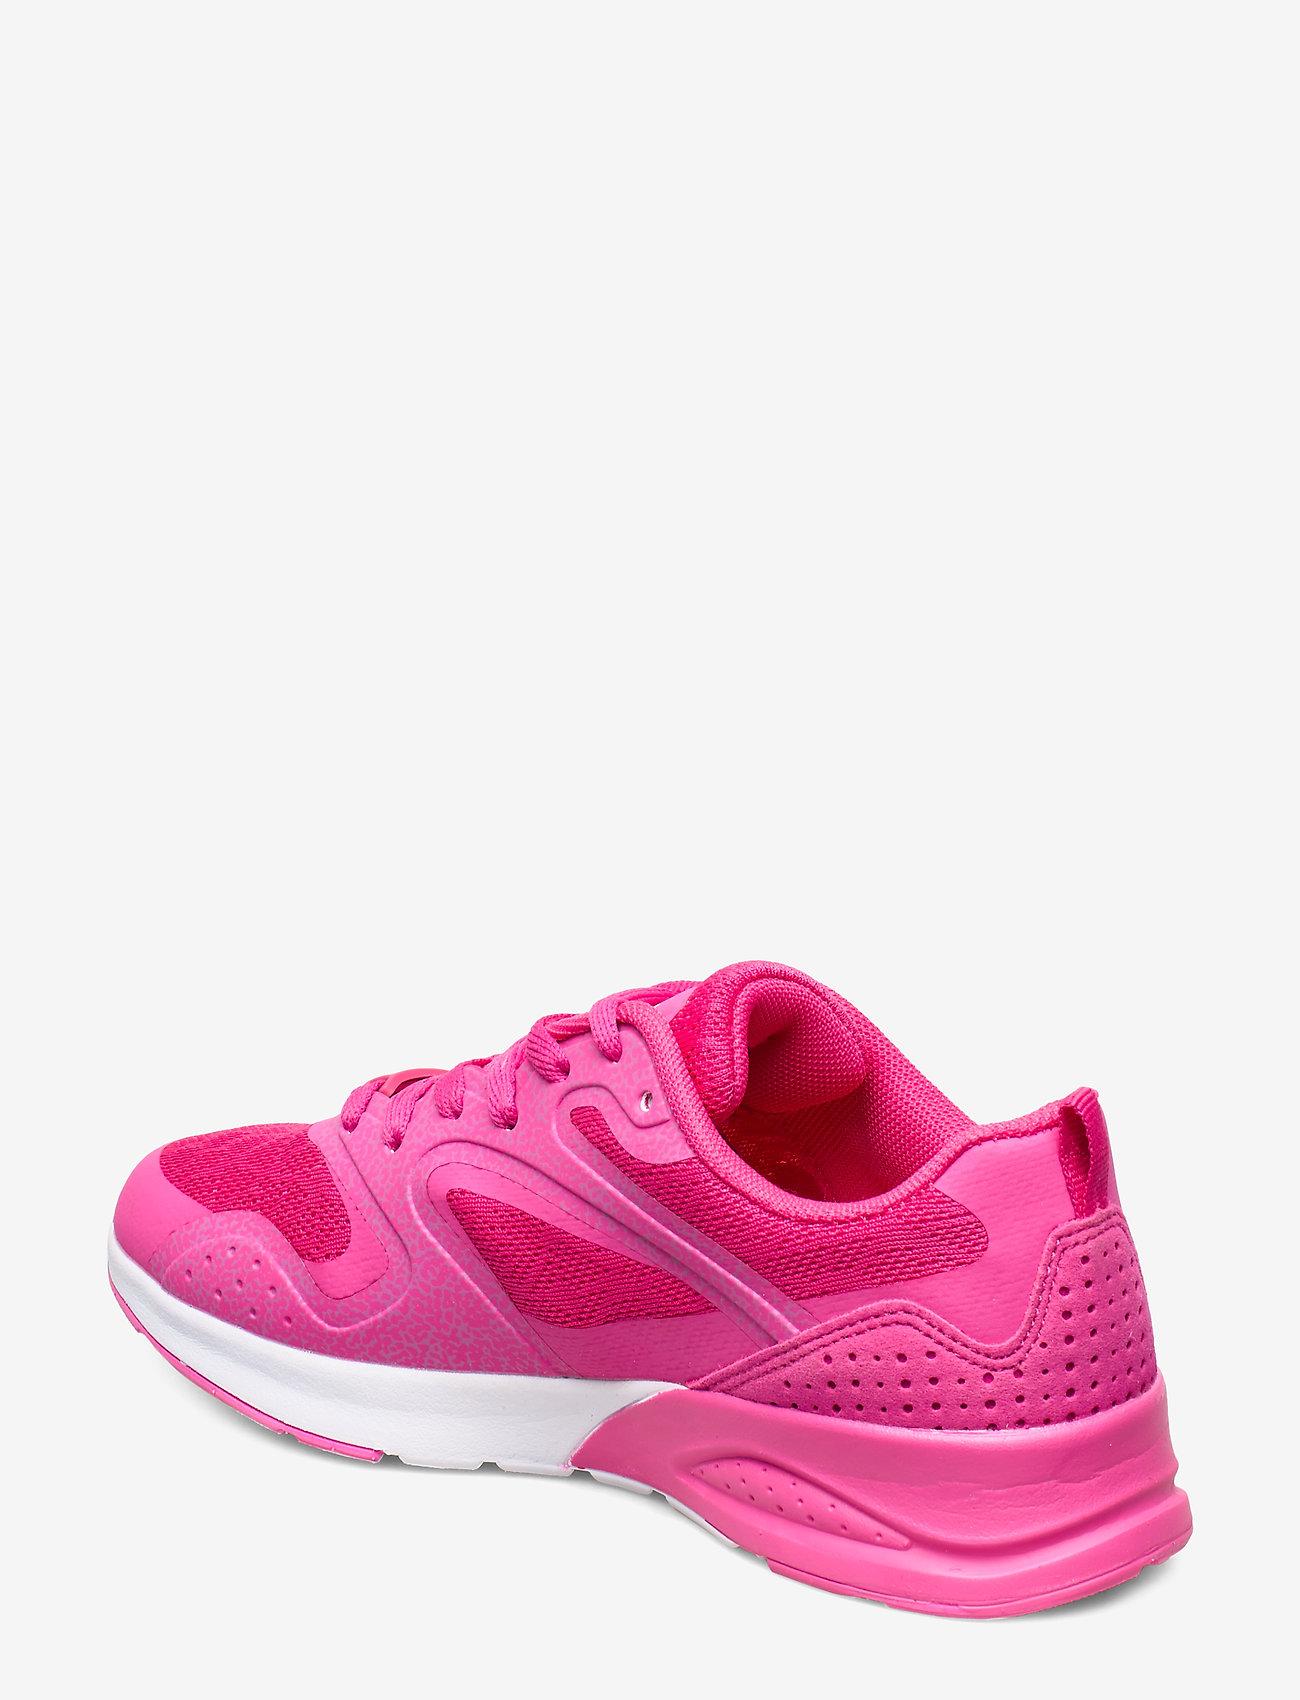 Low Cut Shoe Sleek (Fup) - Champion